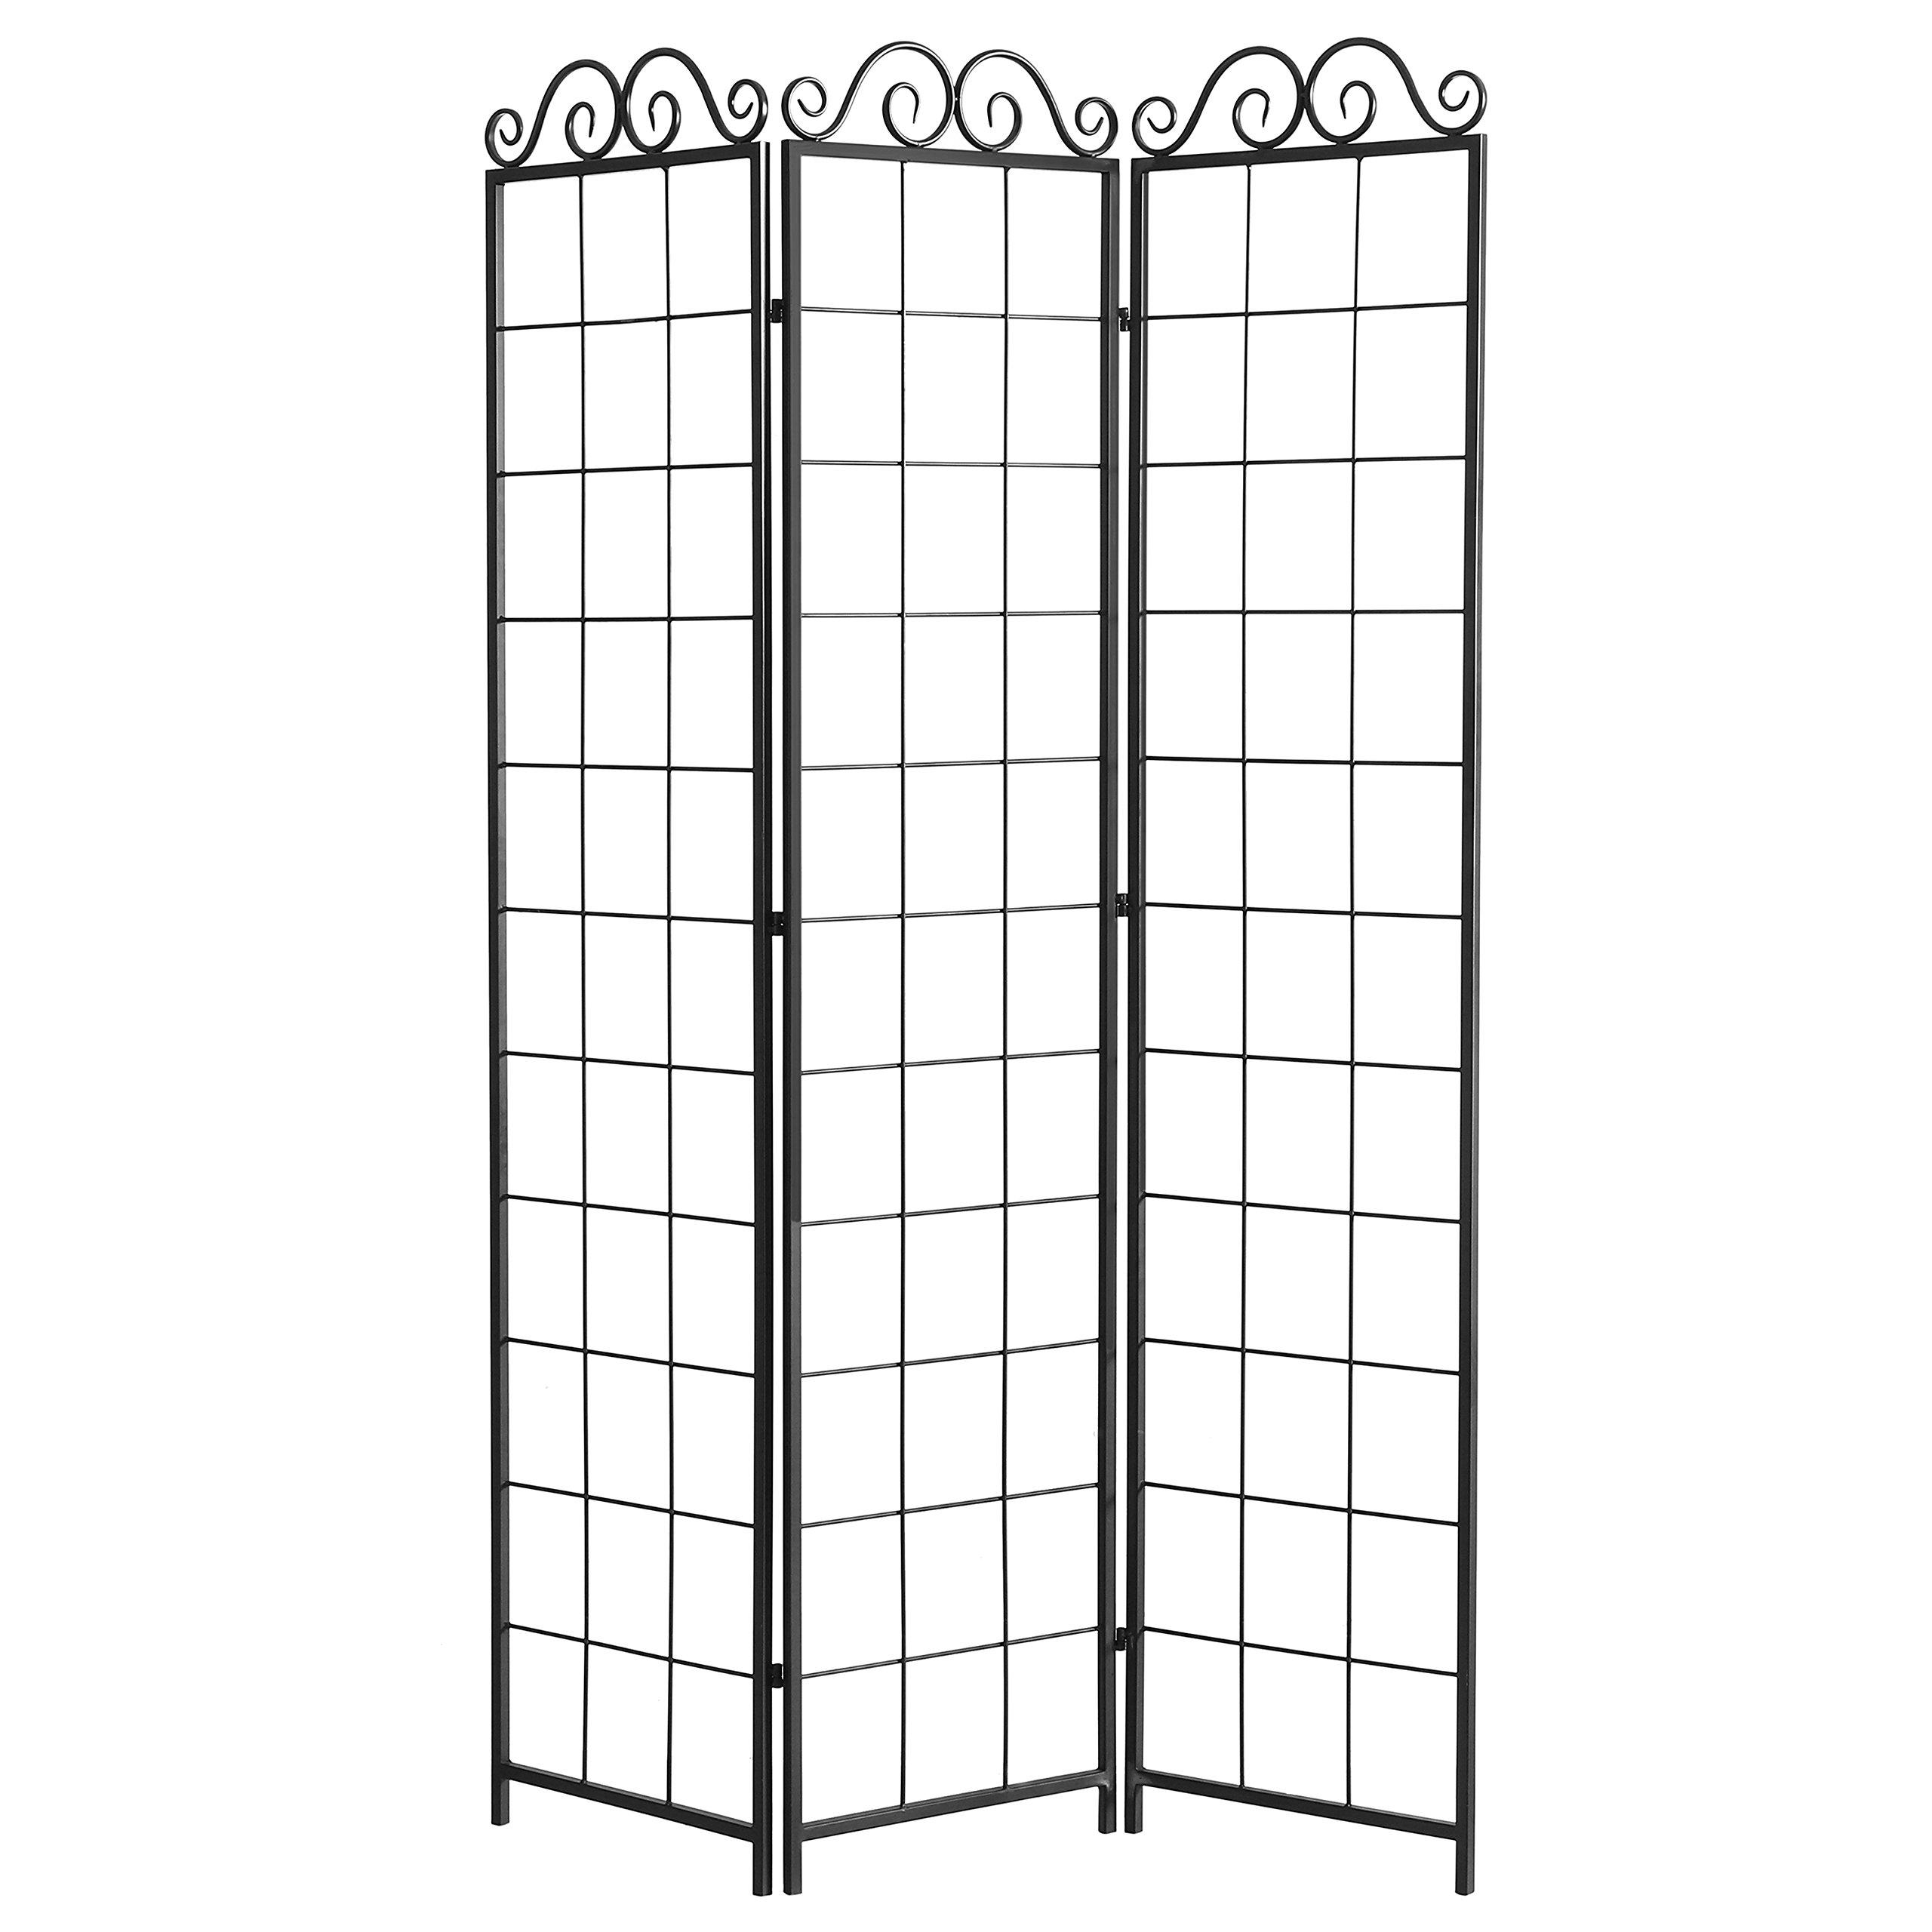 Folding 3 Panel Black Metal Scrollwork Design Wire Trellis Divider Screen